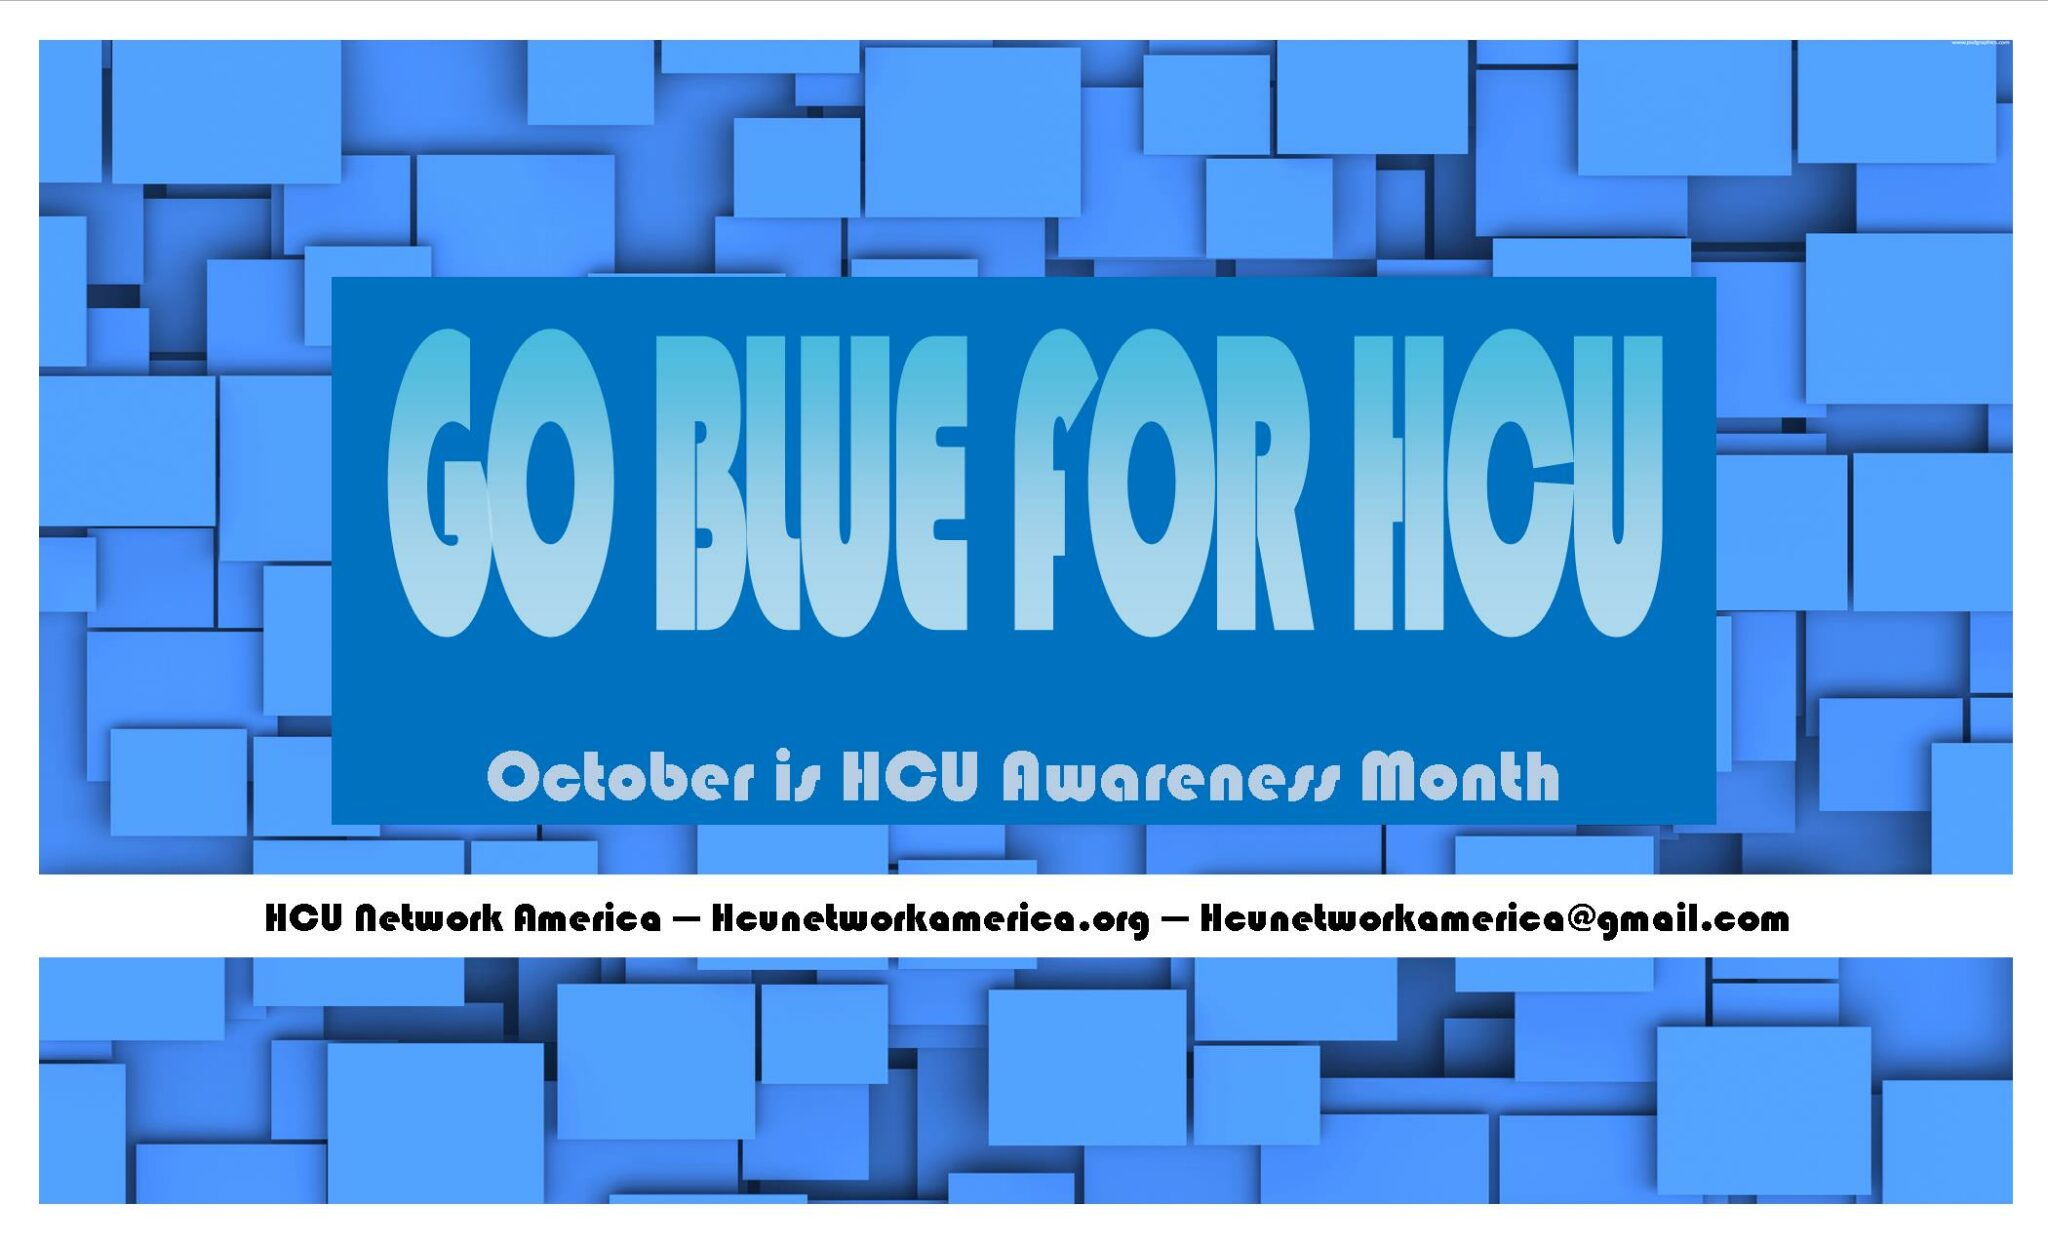 hcuawareness month banner